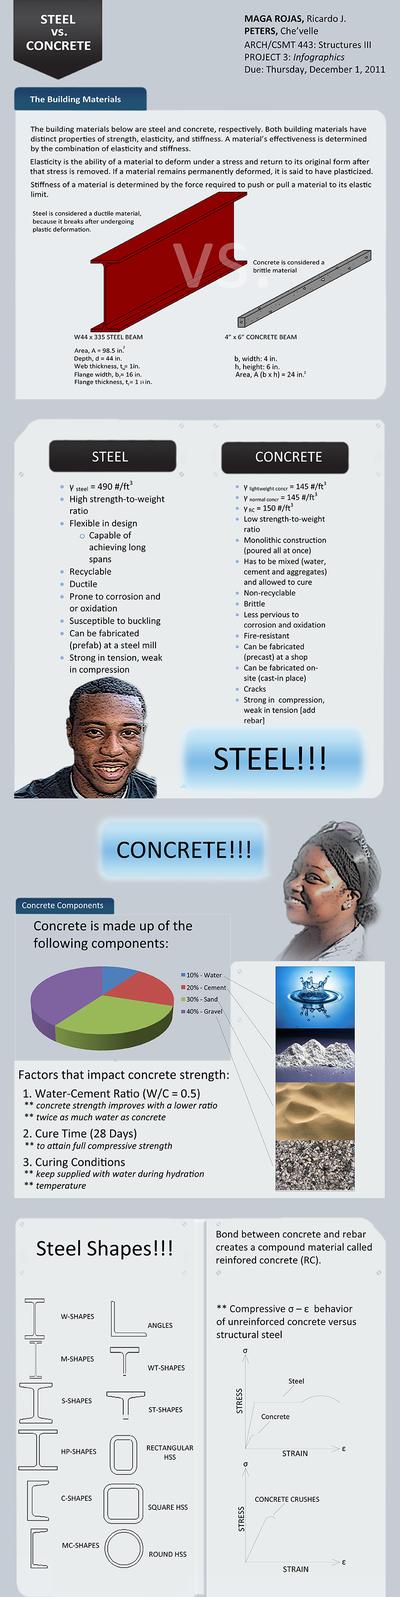 Steel vs. Concrete